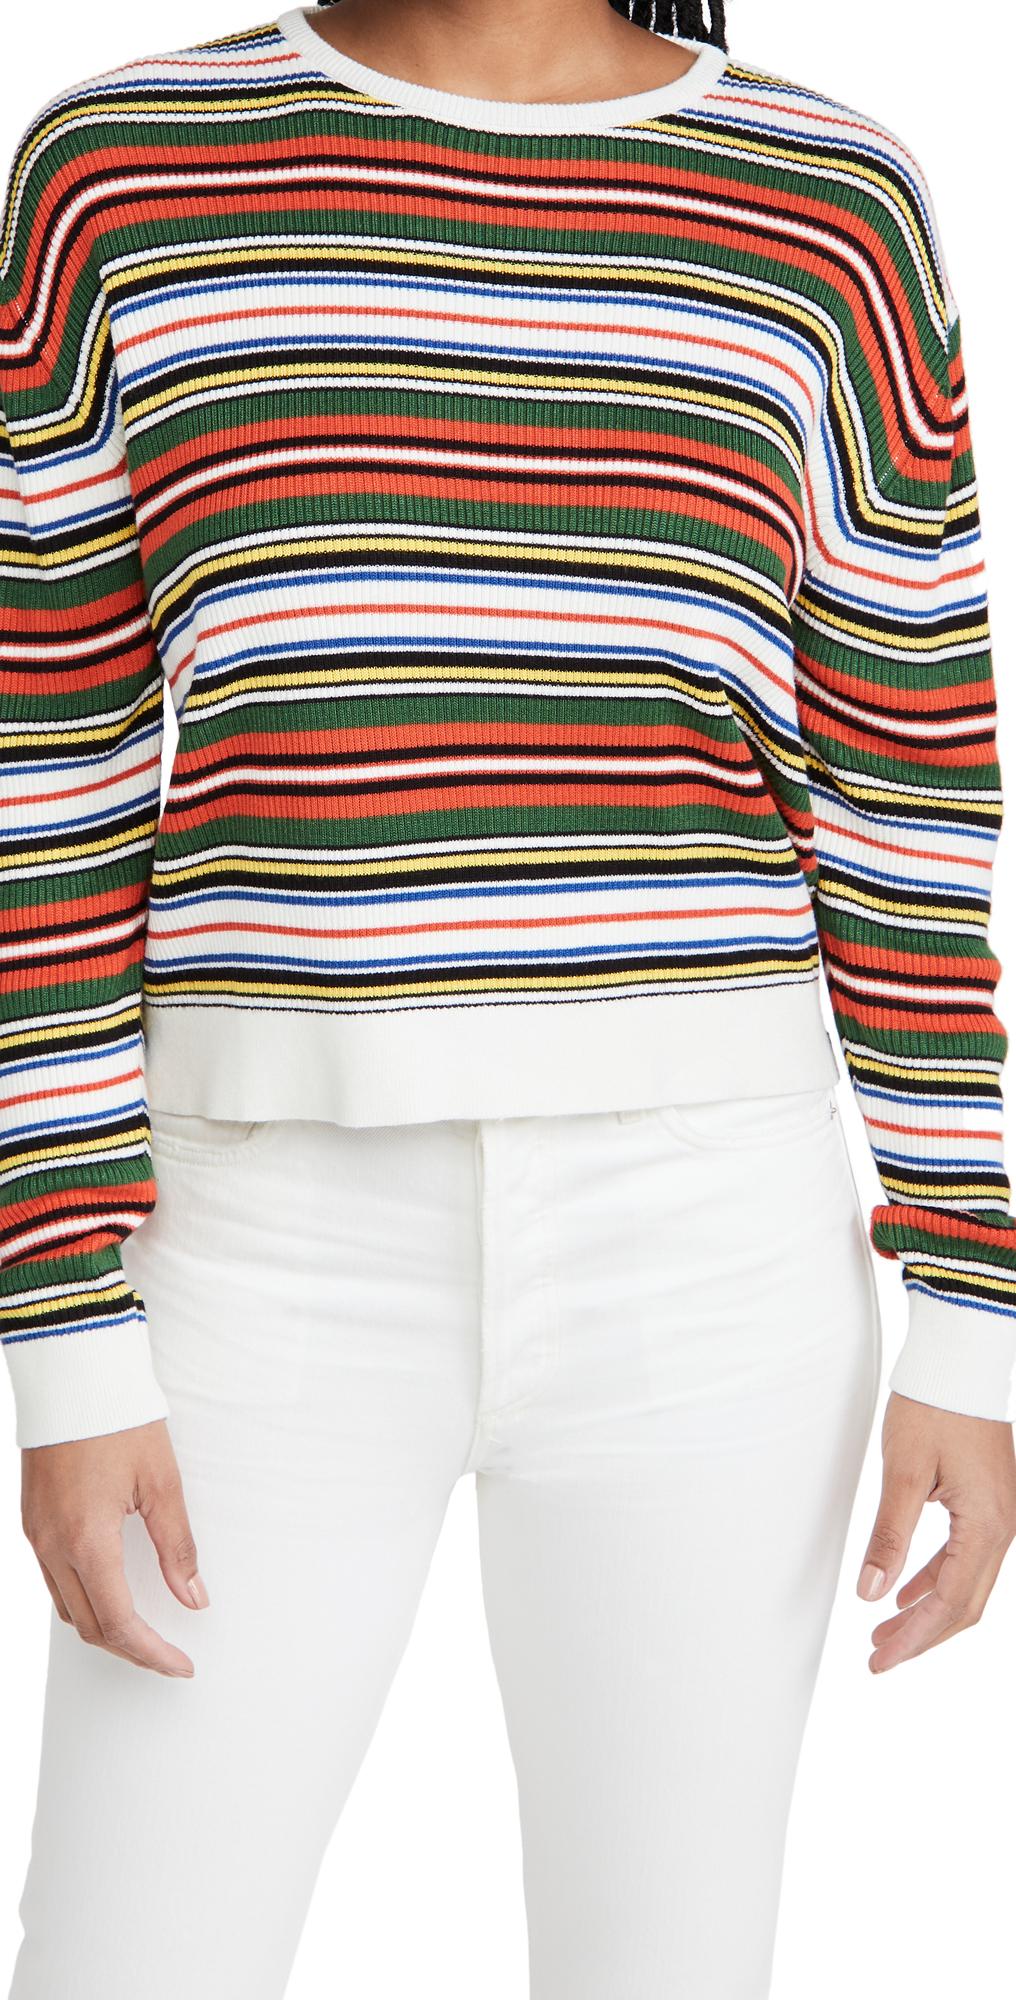 KULE The Millie Sweater